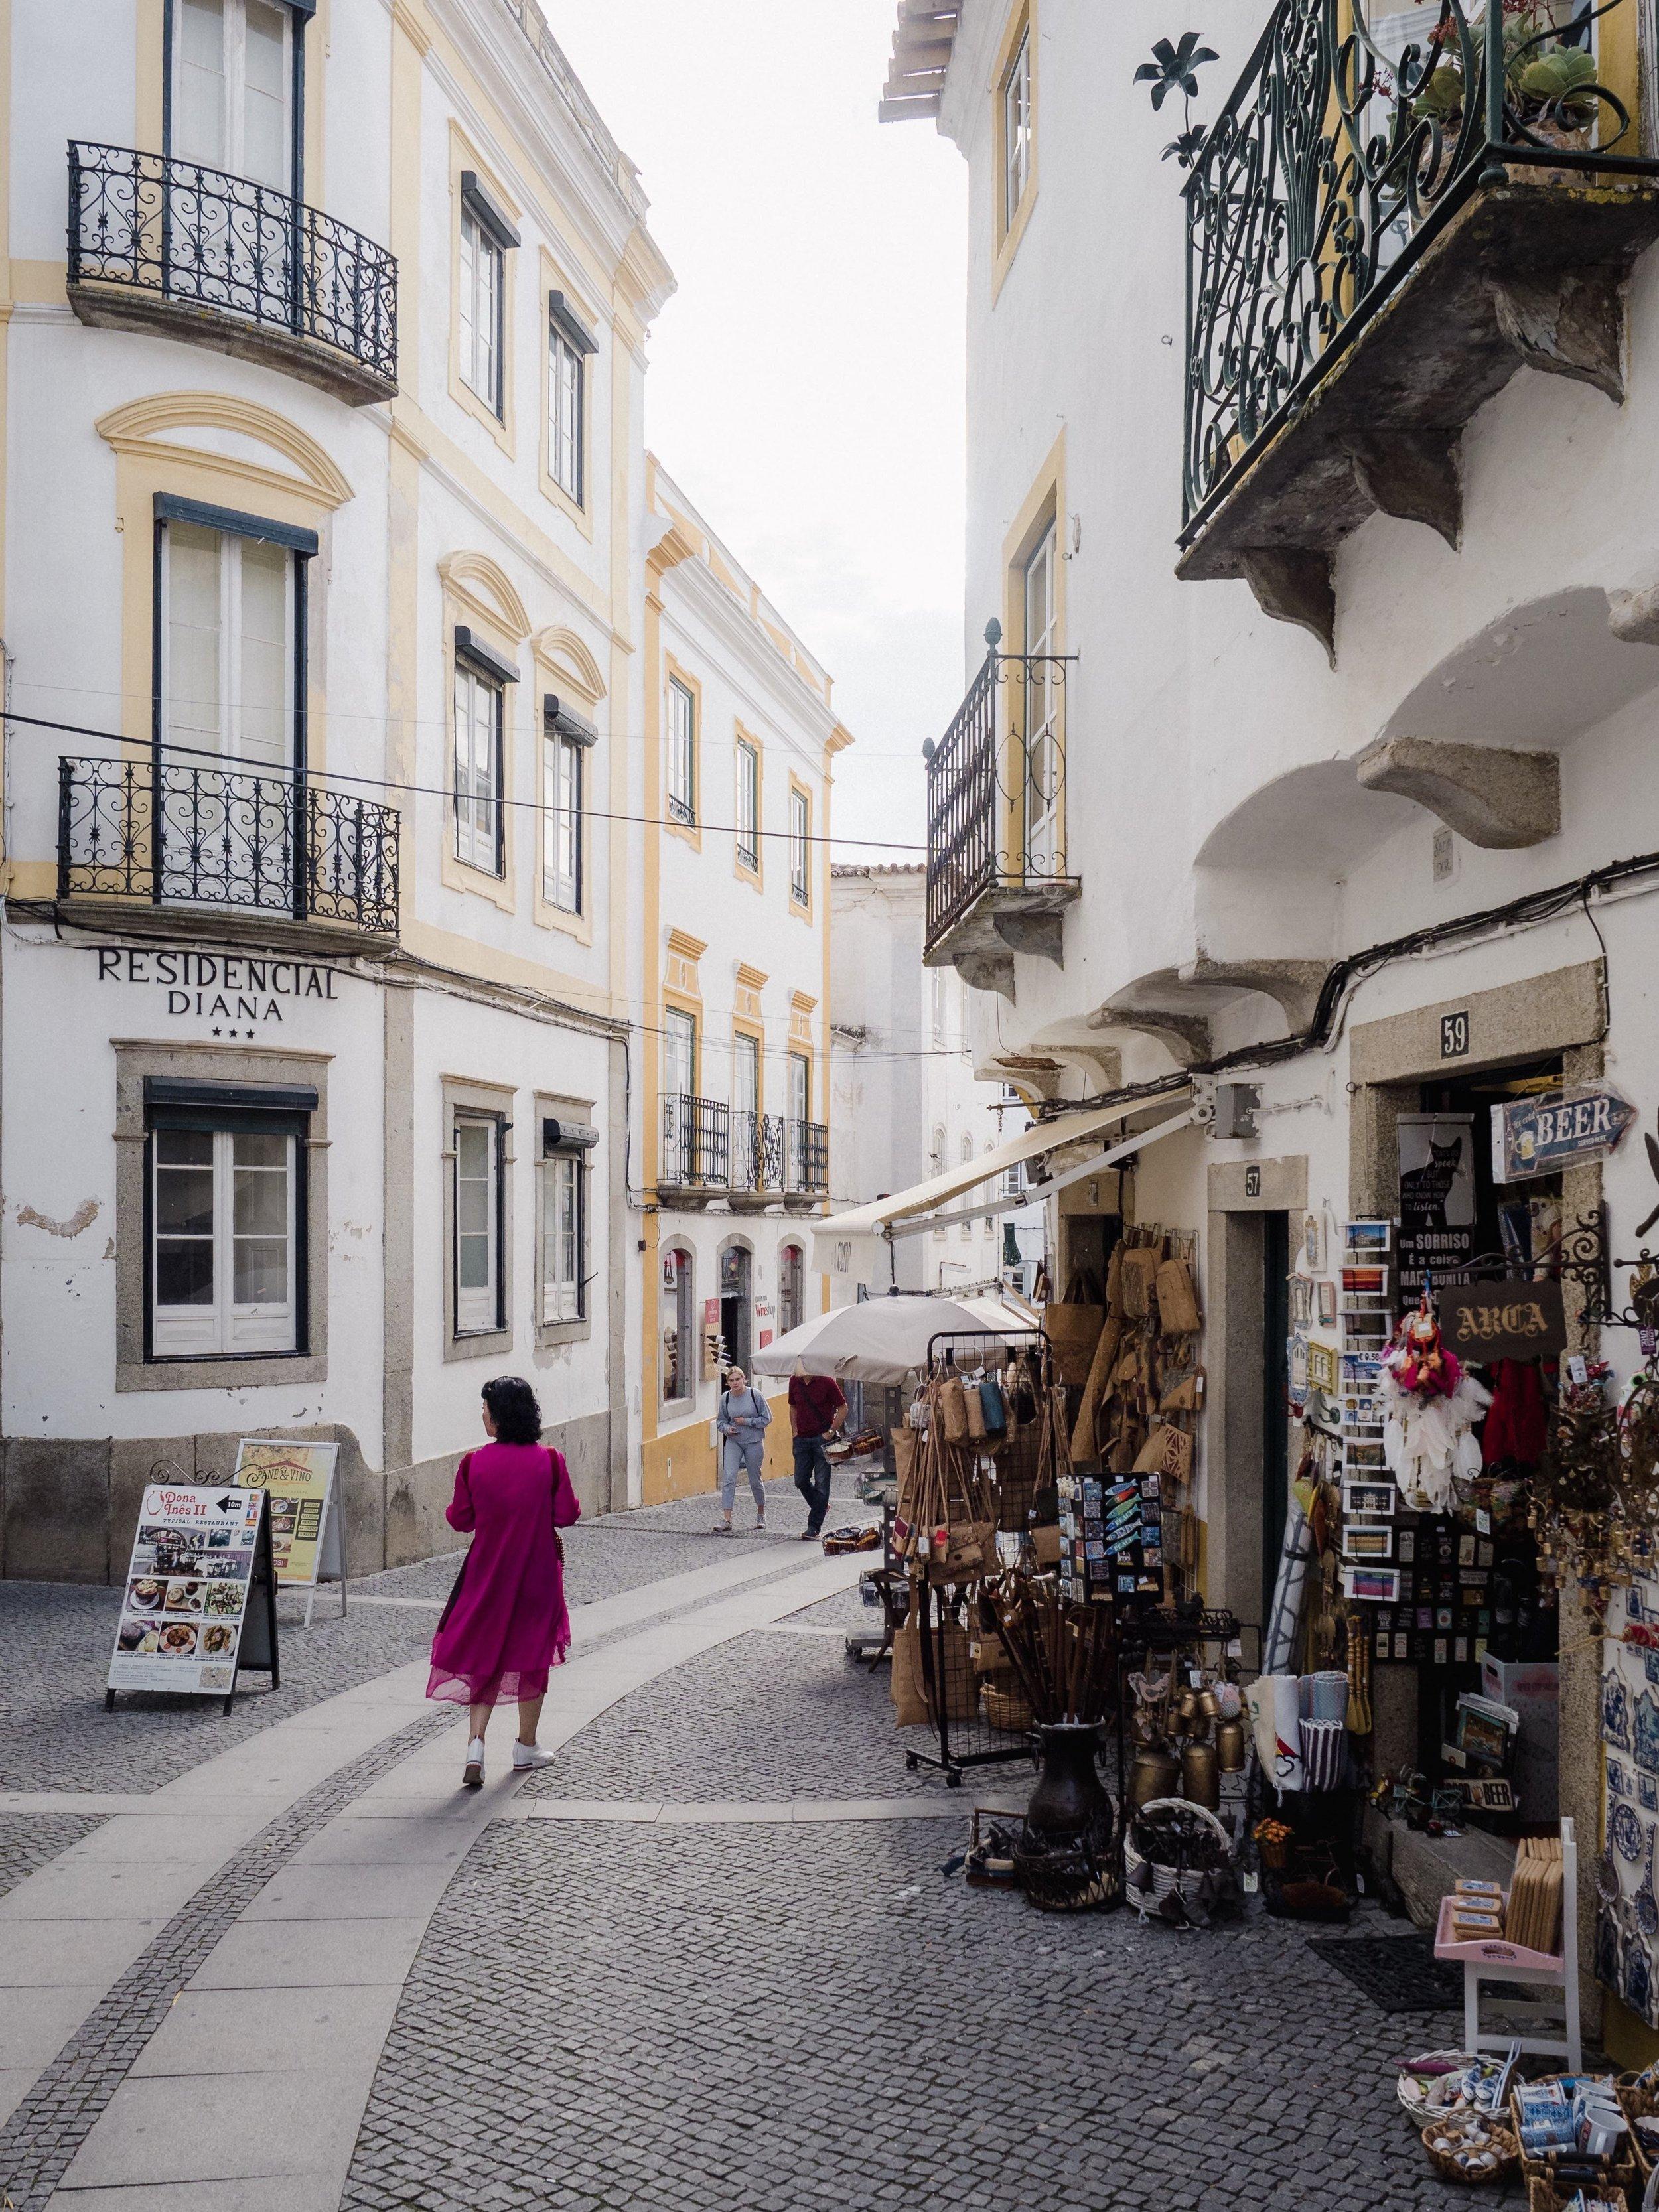 Wandering the streets of Évora.